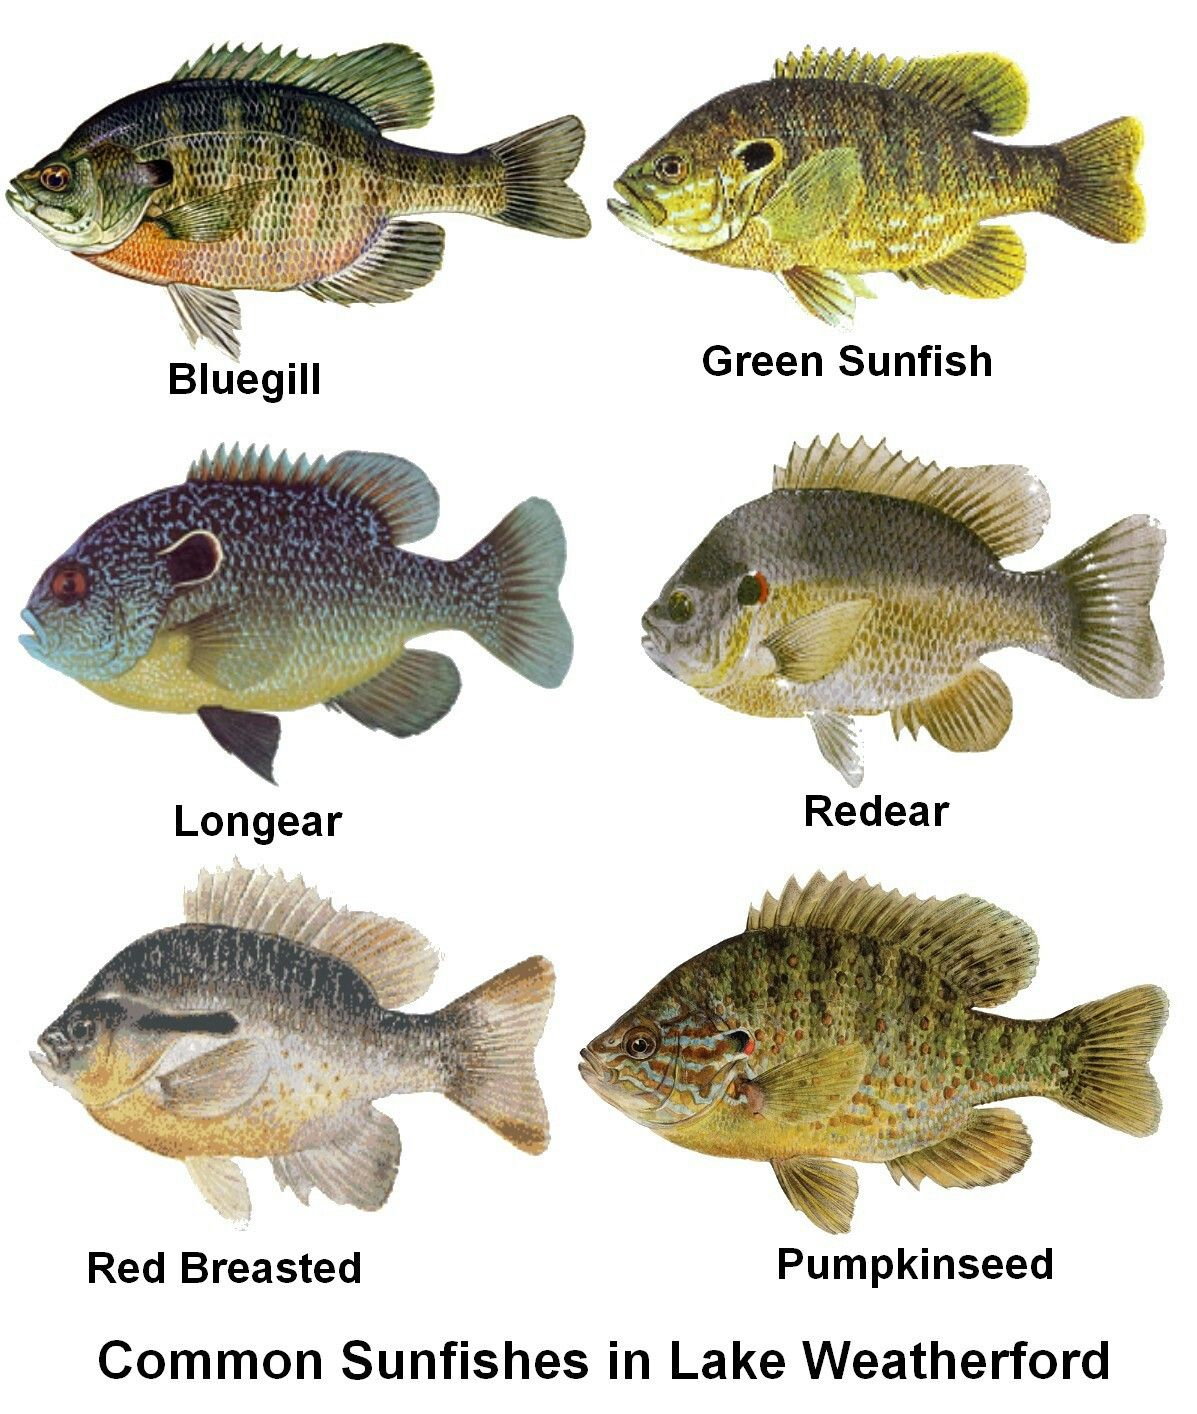 Swamp fish redbreas | Suk Project | Fish, Saltwater fishing